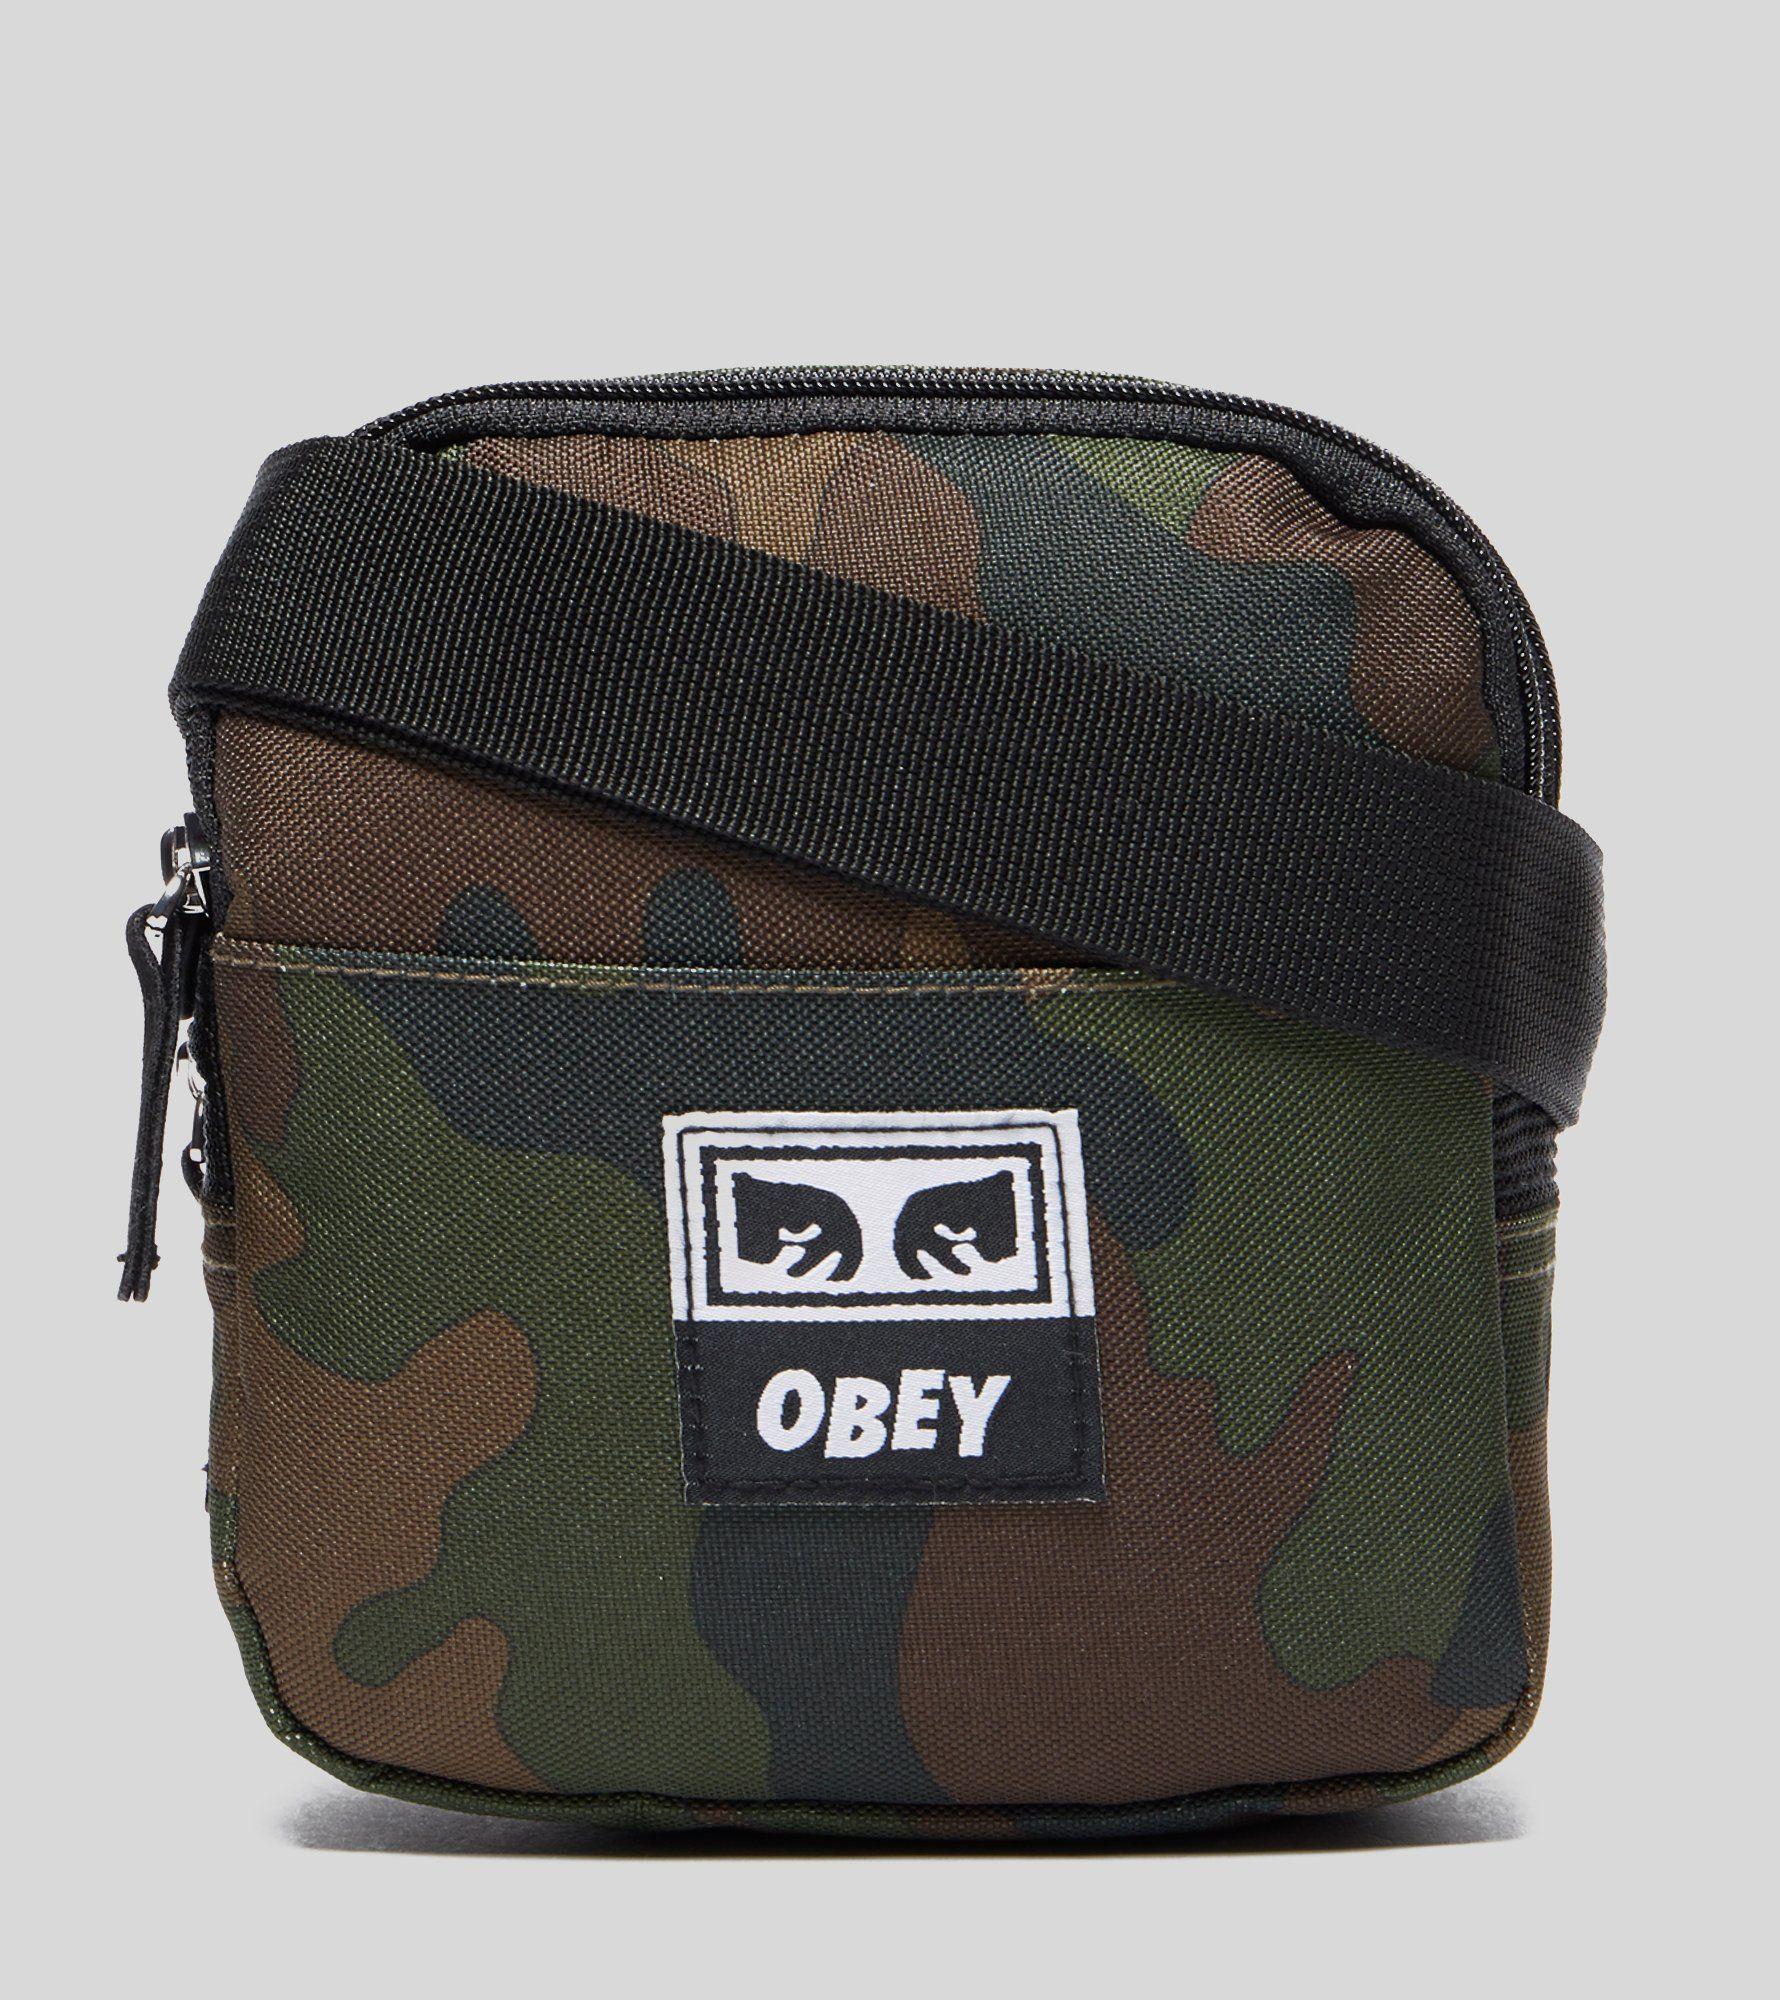 Obey Drop Out Traveller Bag